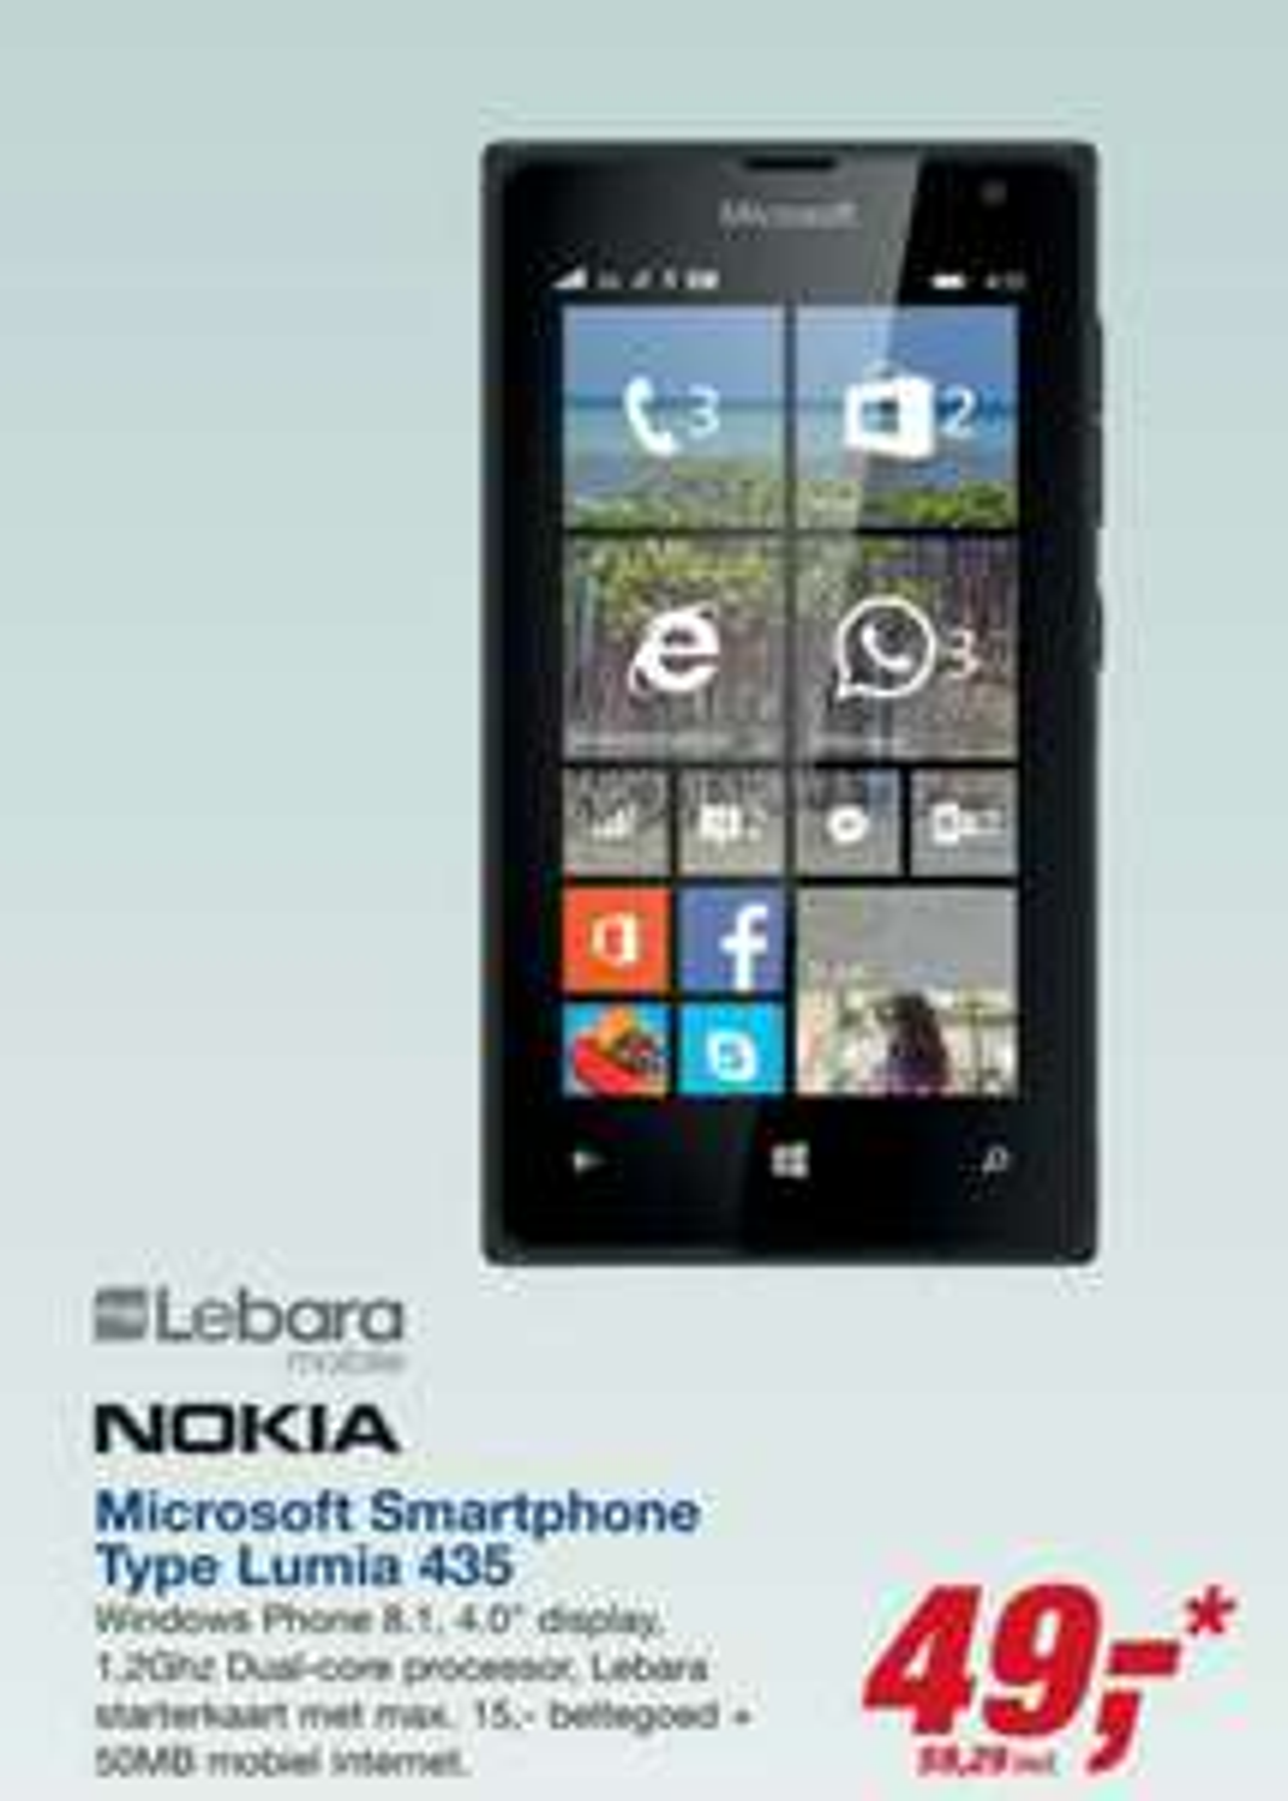 Microsoft Lumia 435 + Lebara Starterkaart met €15 beltegoed en 50mb Internet voor €59,29 @ Makro